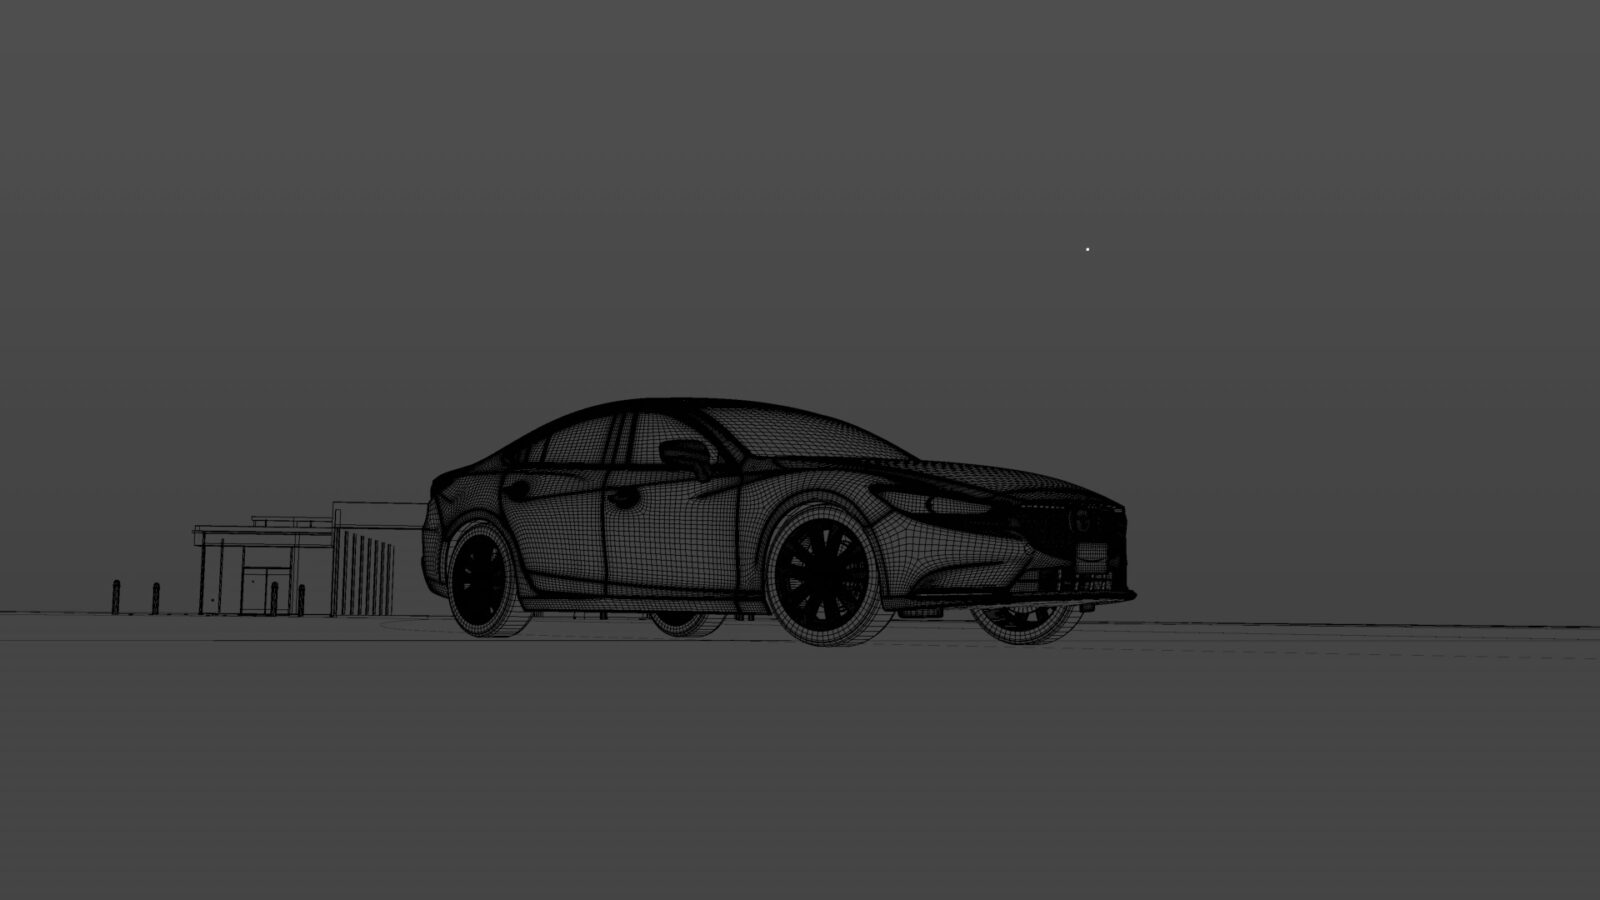 render_carvana_sc_050_intro_car_v035_shadow-mp4_20210201_183033-540